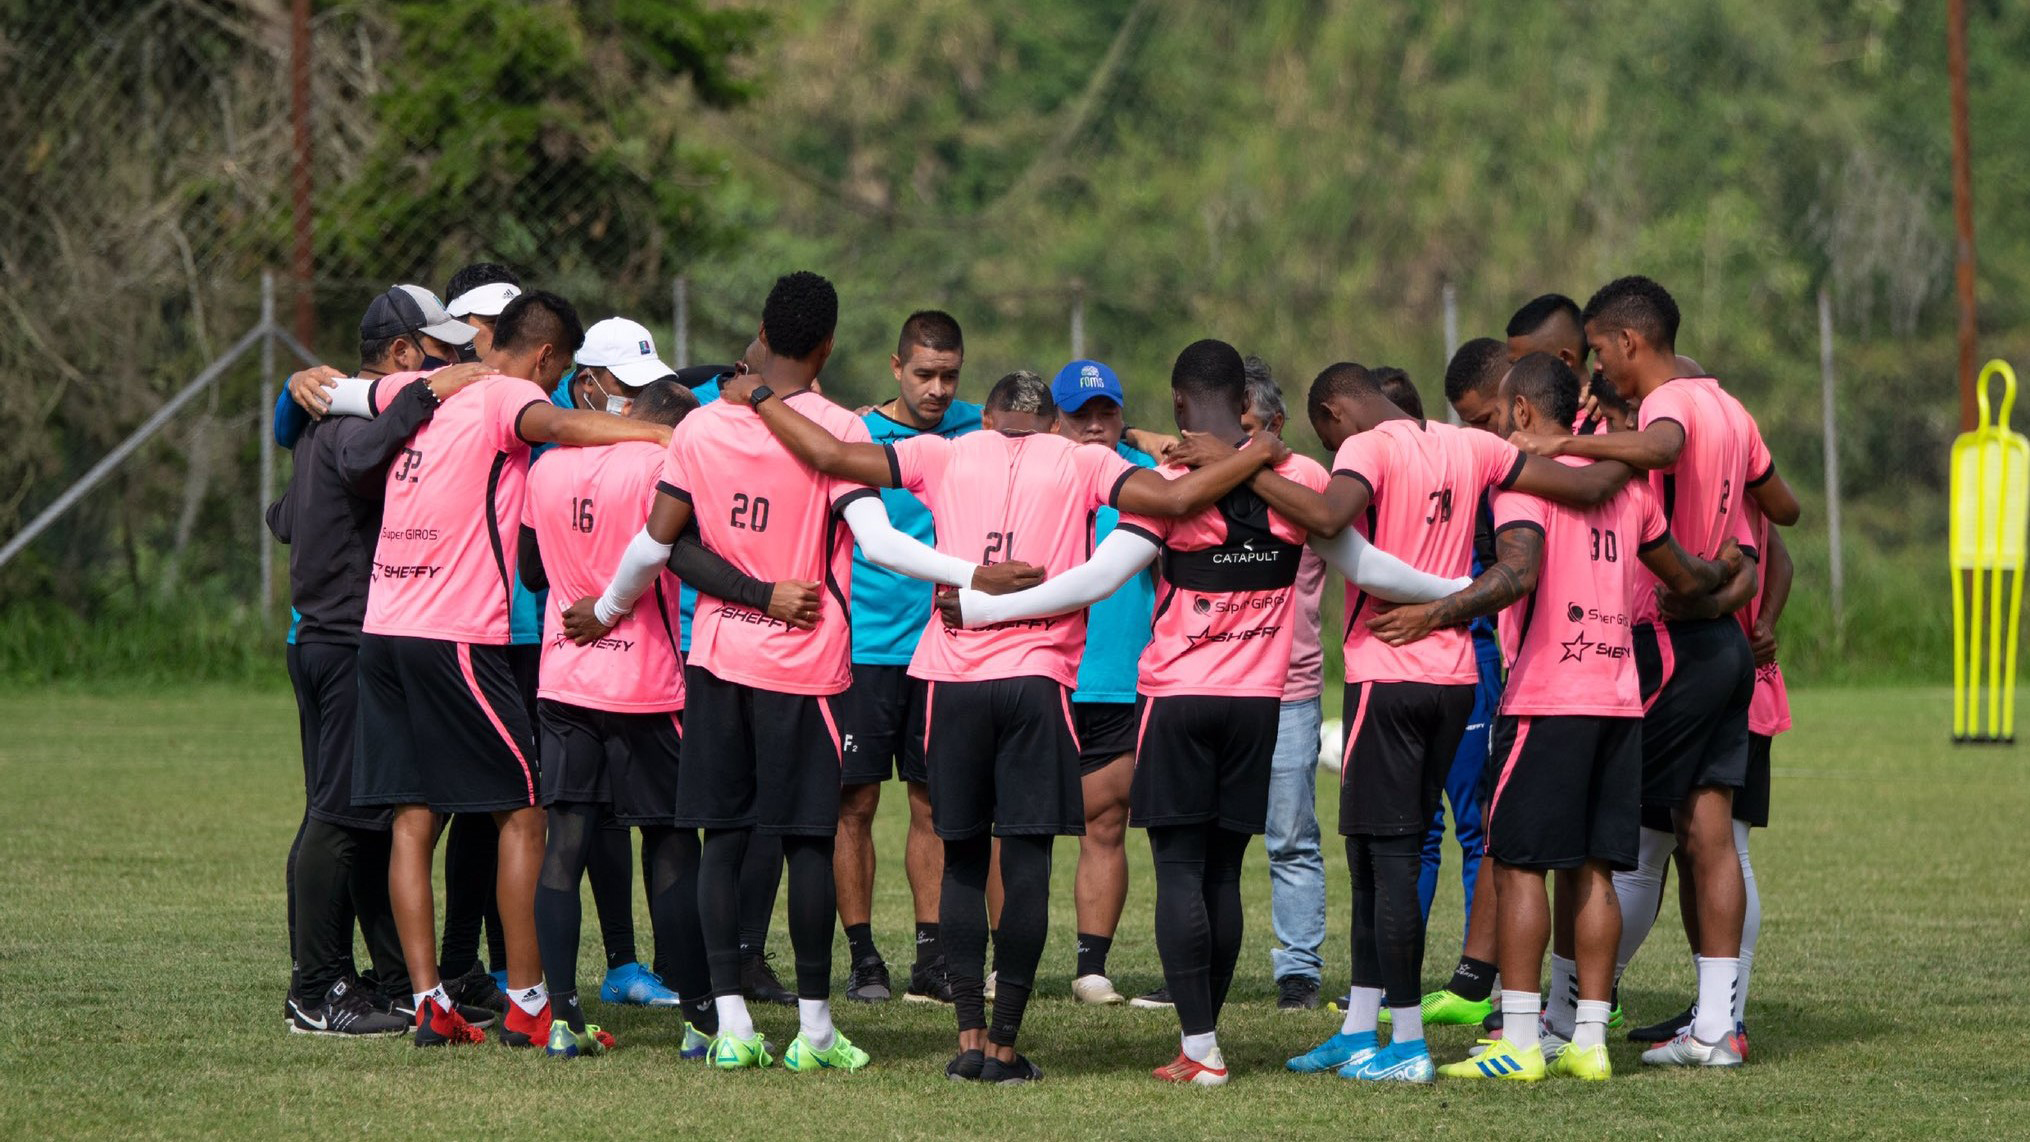 Once Caldas vs Corinthians casa blanca oc